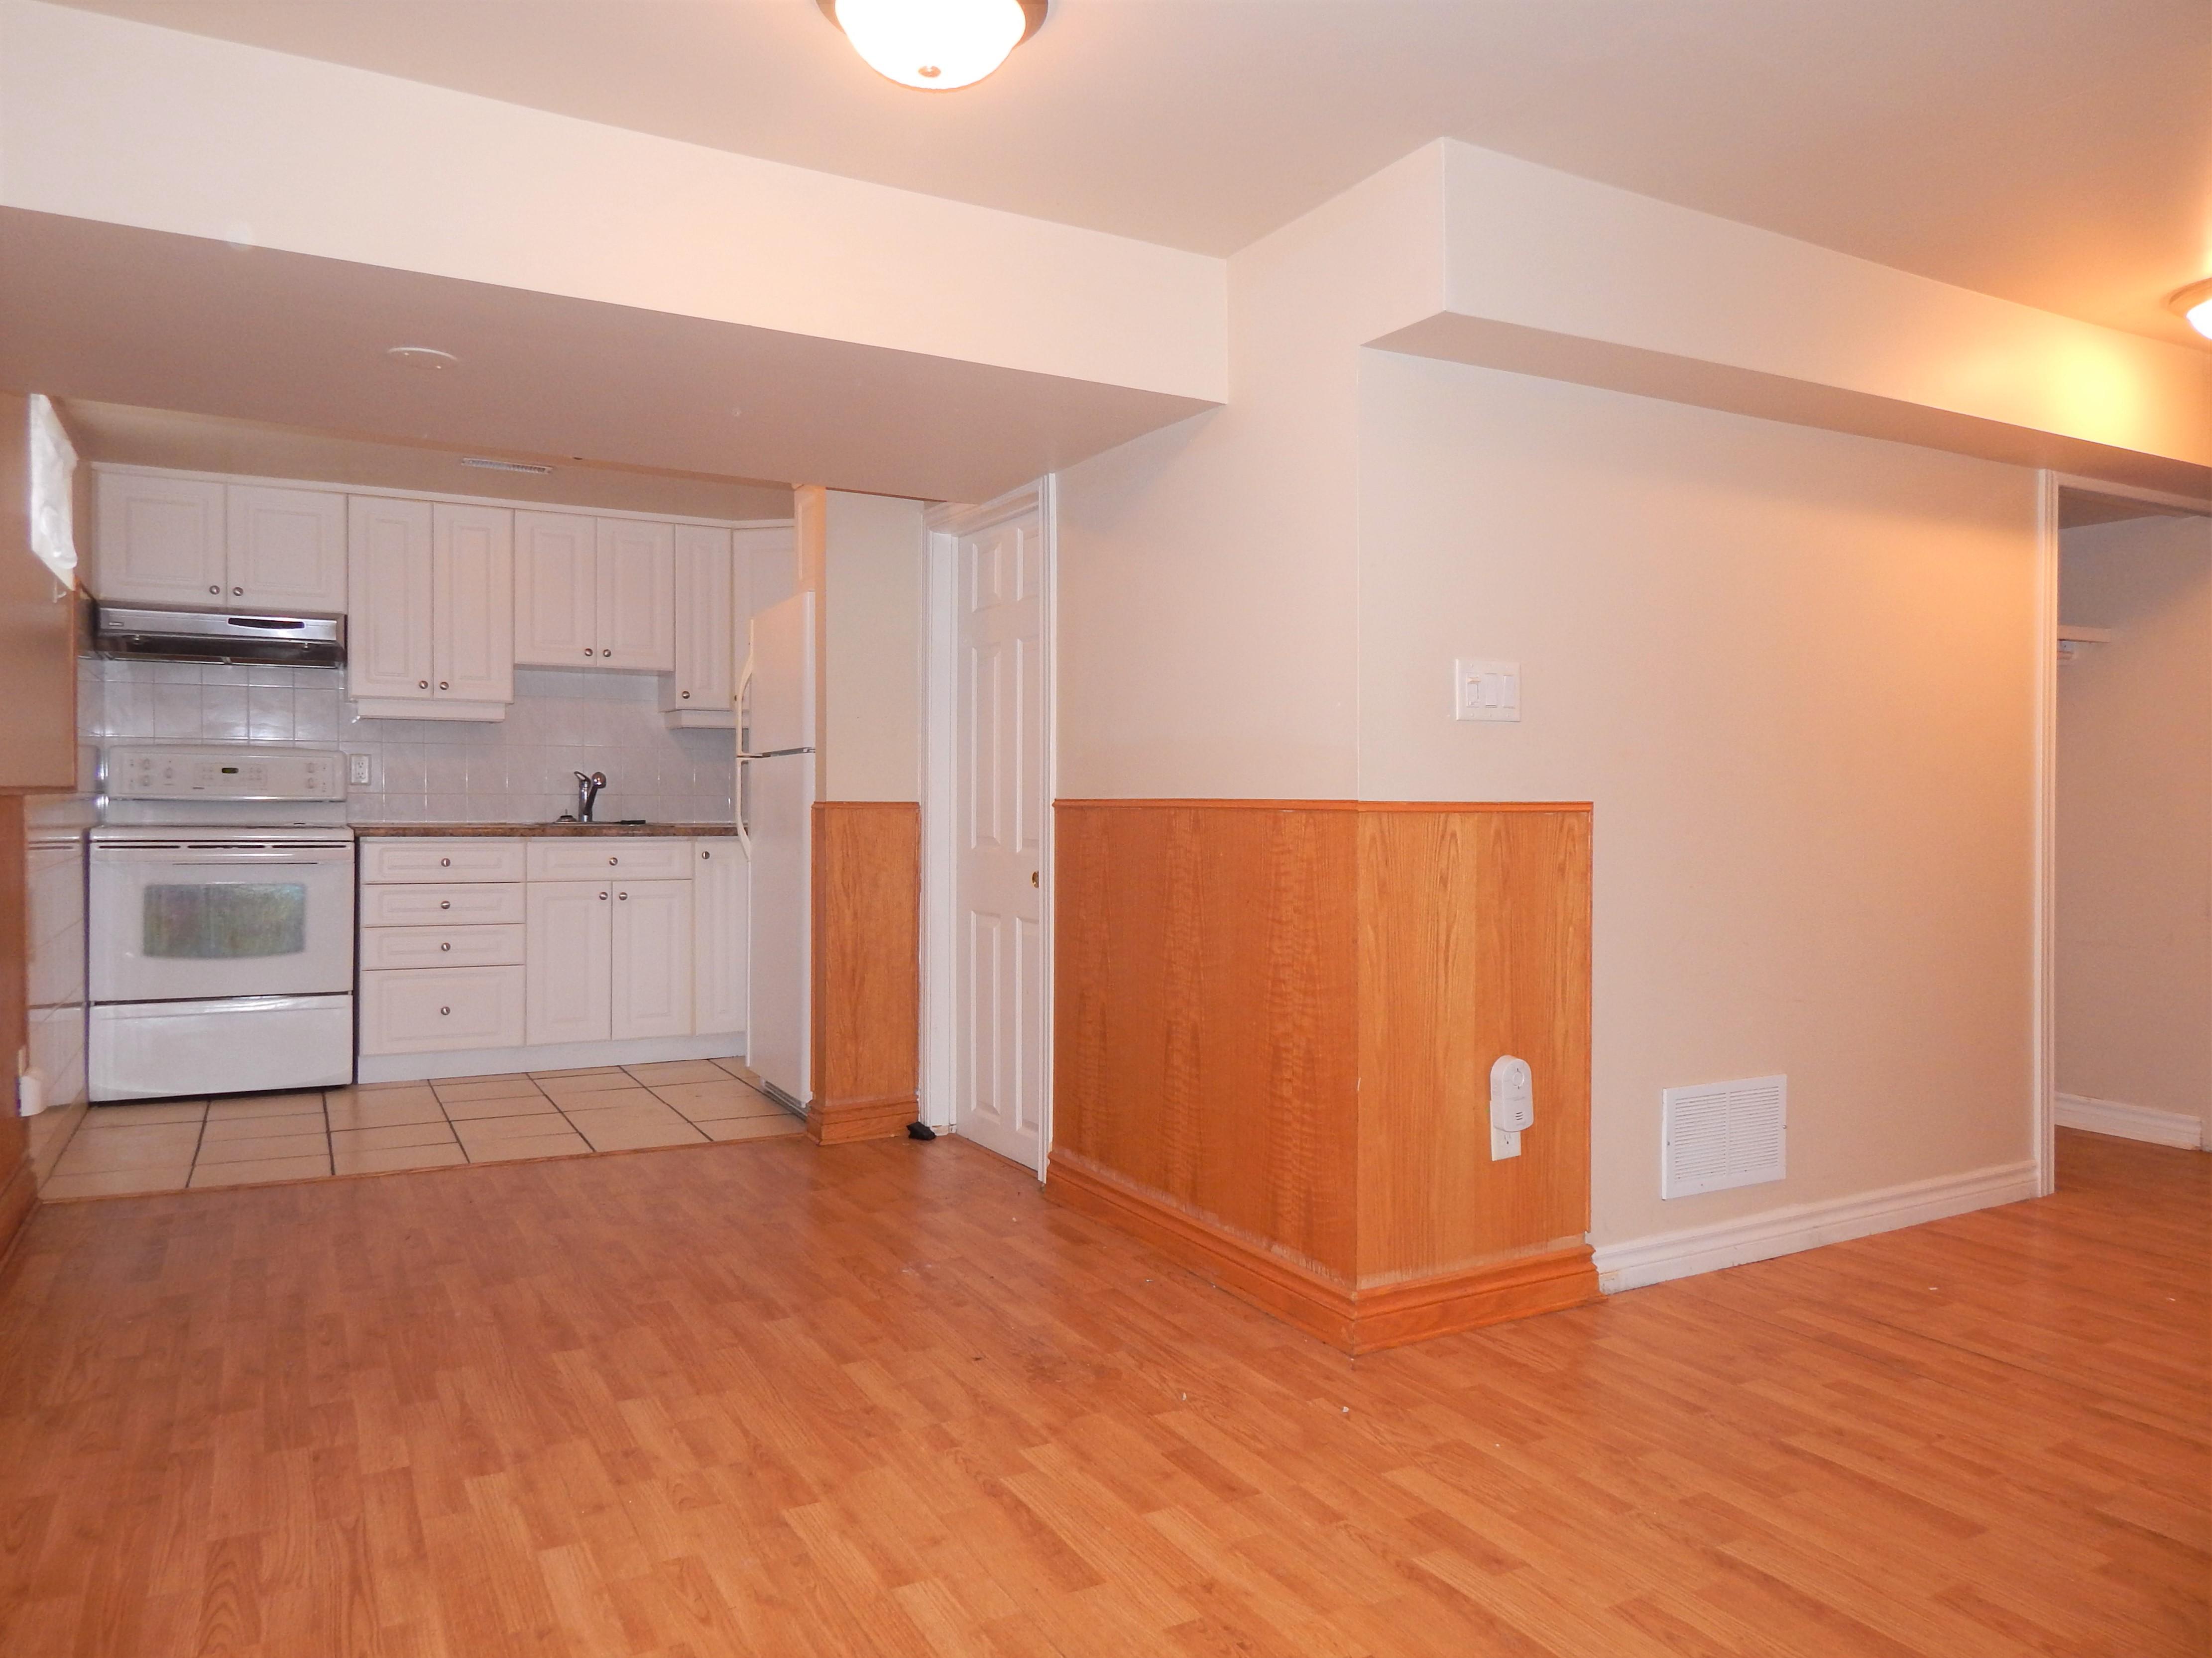 Spacious Two Bedroom Basement Apartment - Medallion Capital